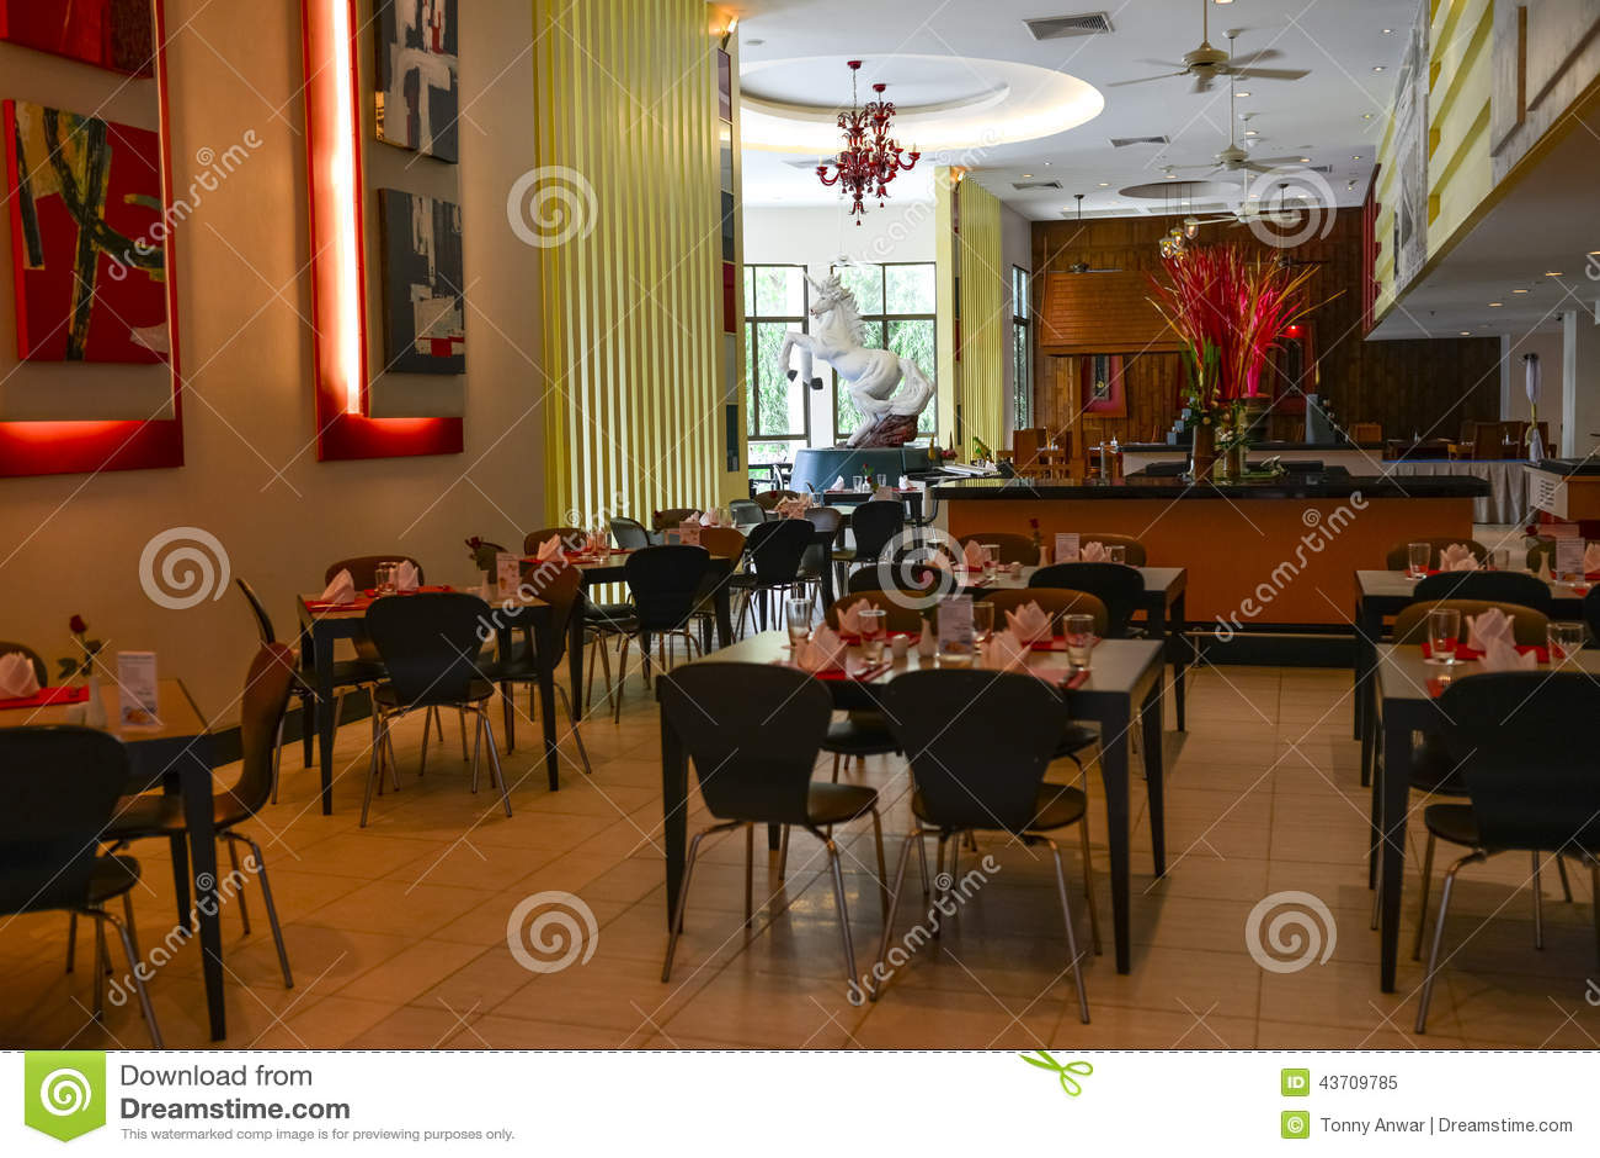 Restaurant Interior Setup : Restaurant editorial image